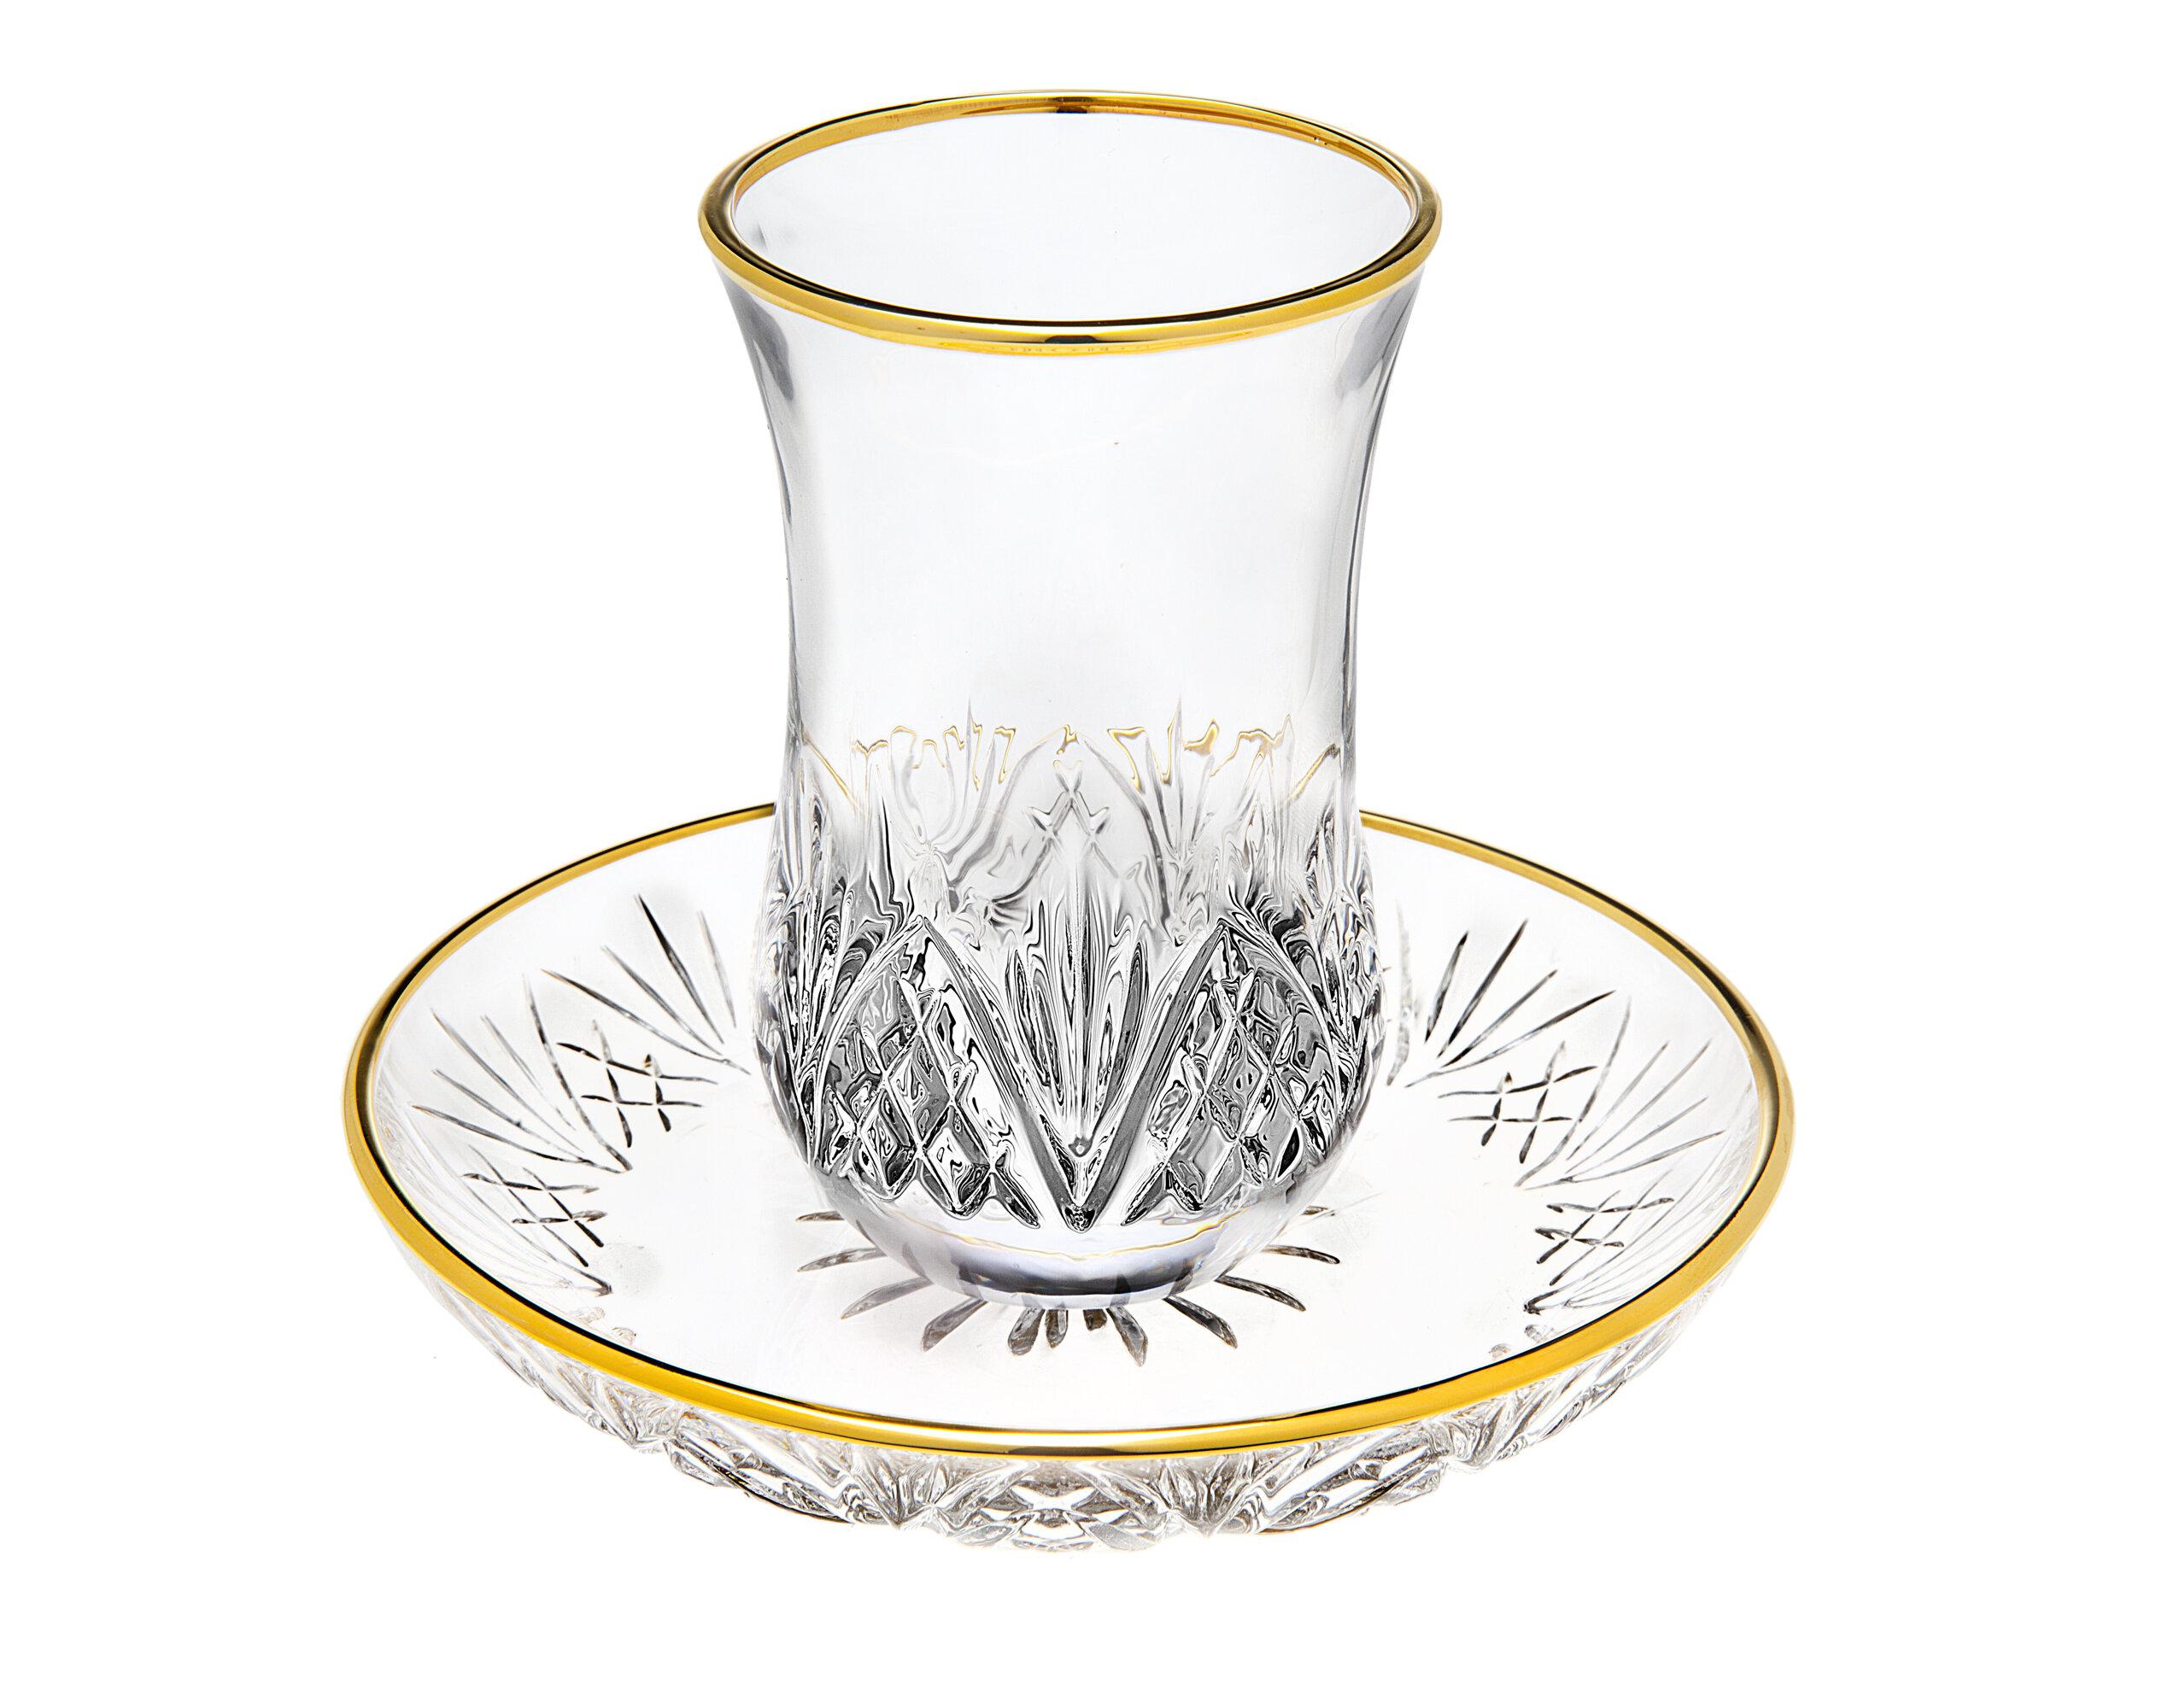 Godinger Silver Art Co Dublin Gold Rim Kiddush Cups Wayfair